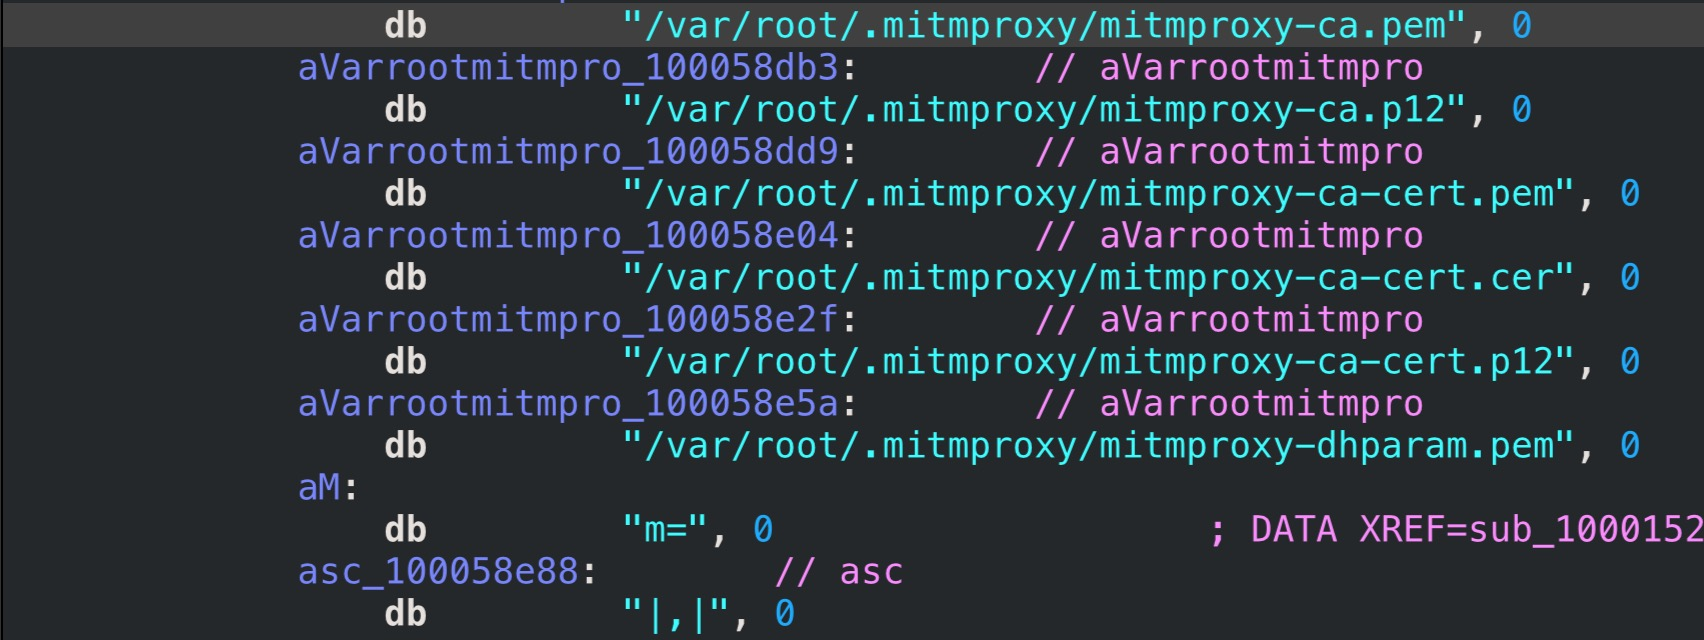 image of mitmproxy